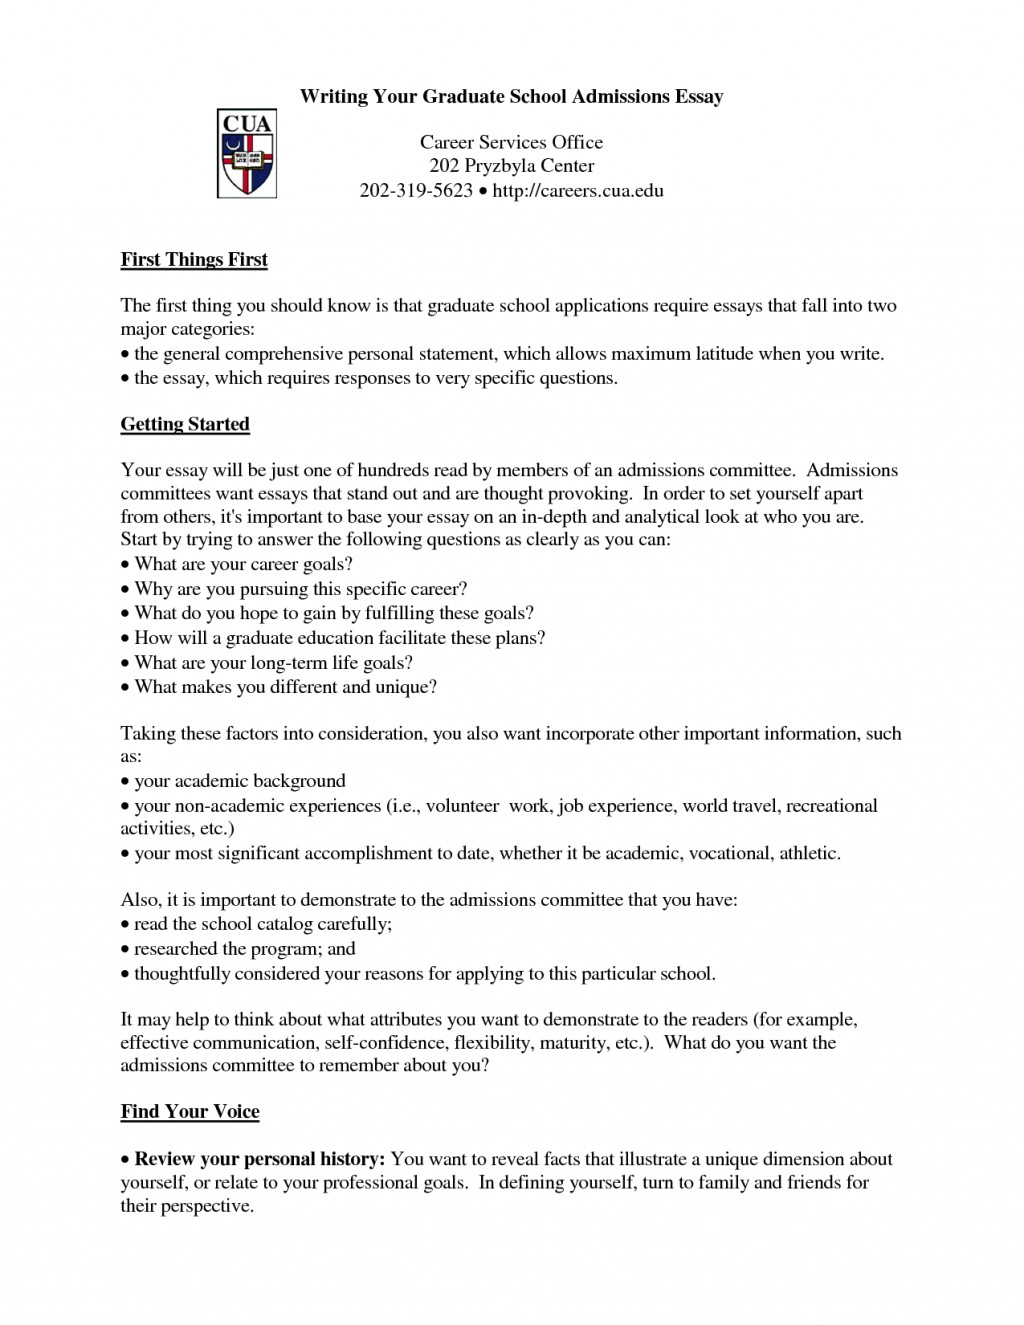 002 Essay Example Free Sample For Graduate School Admission Formidable Pdf Large